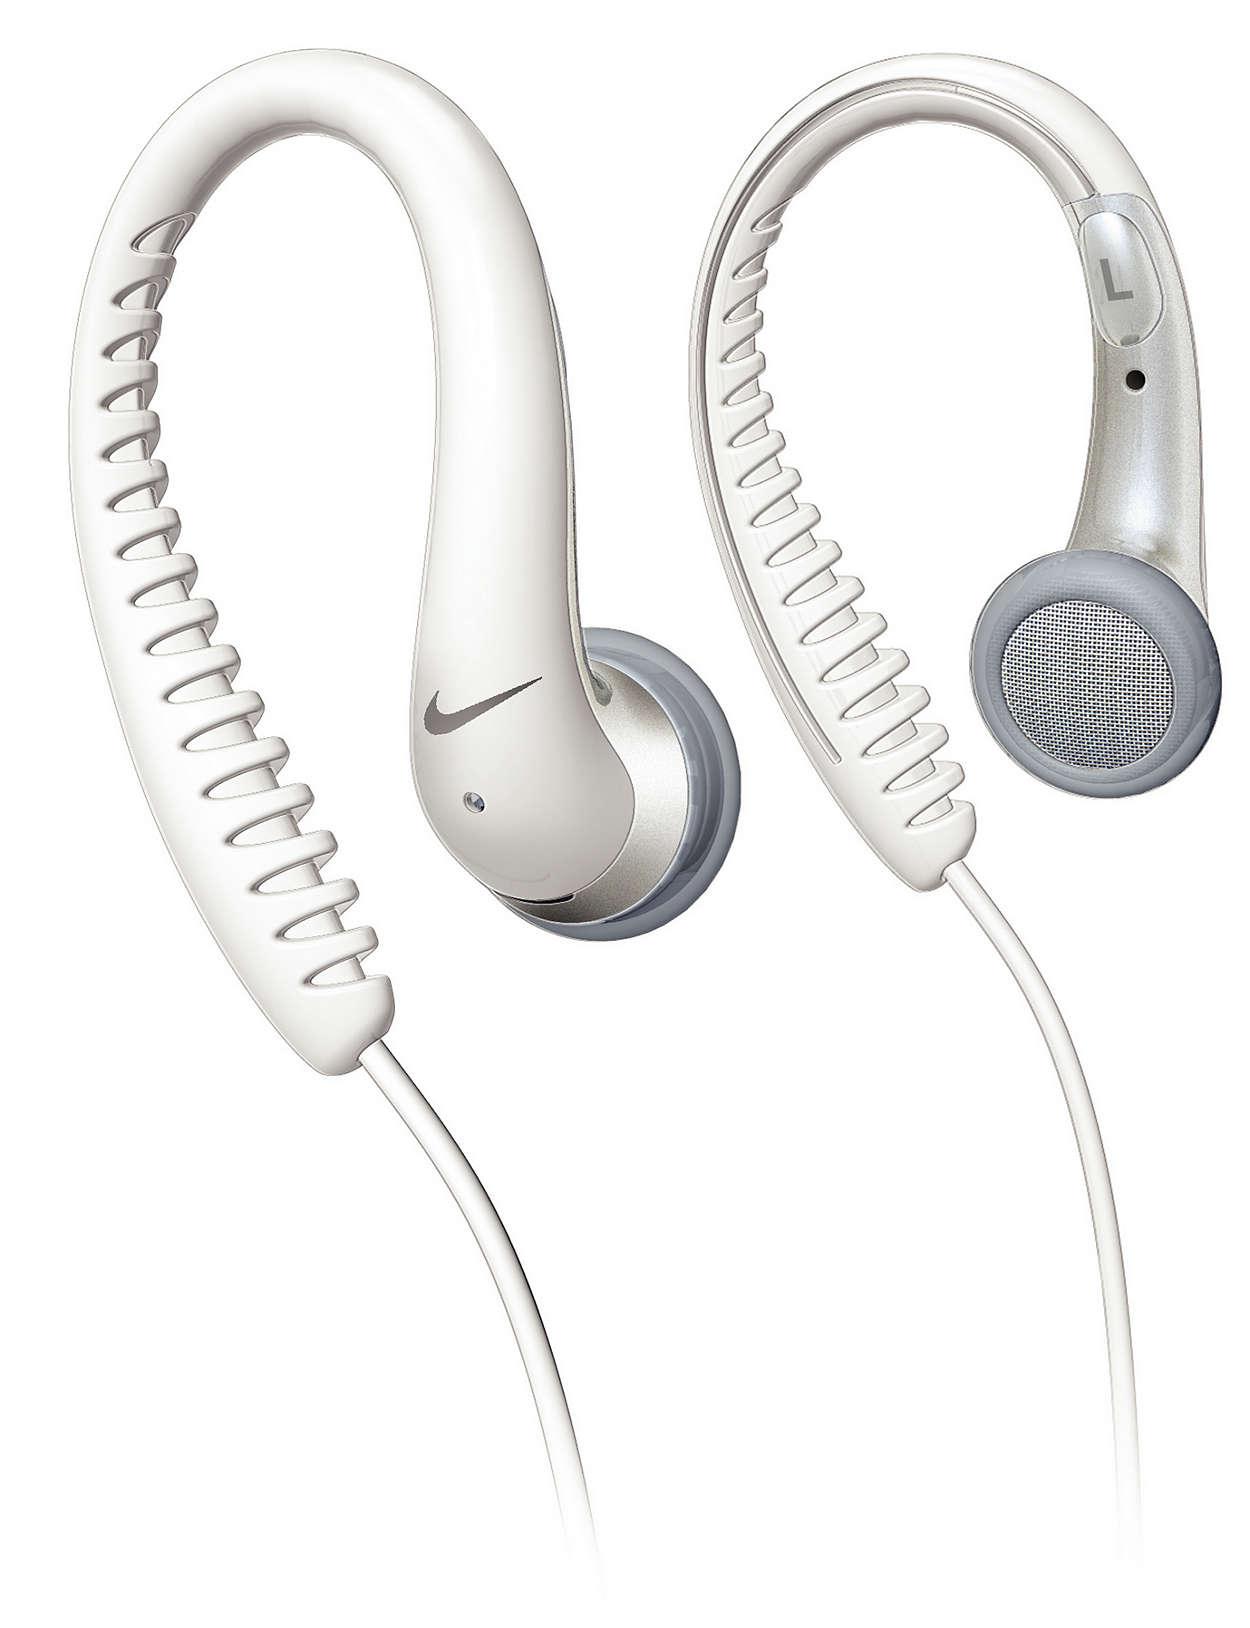 Suport pentru ureche cauciucat, flexibil